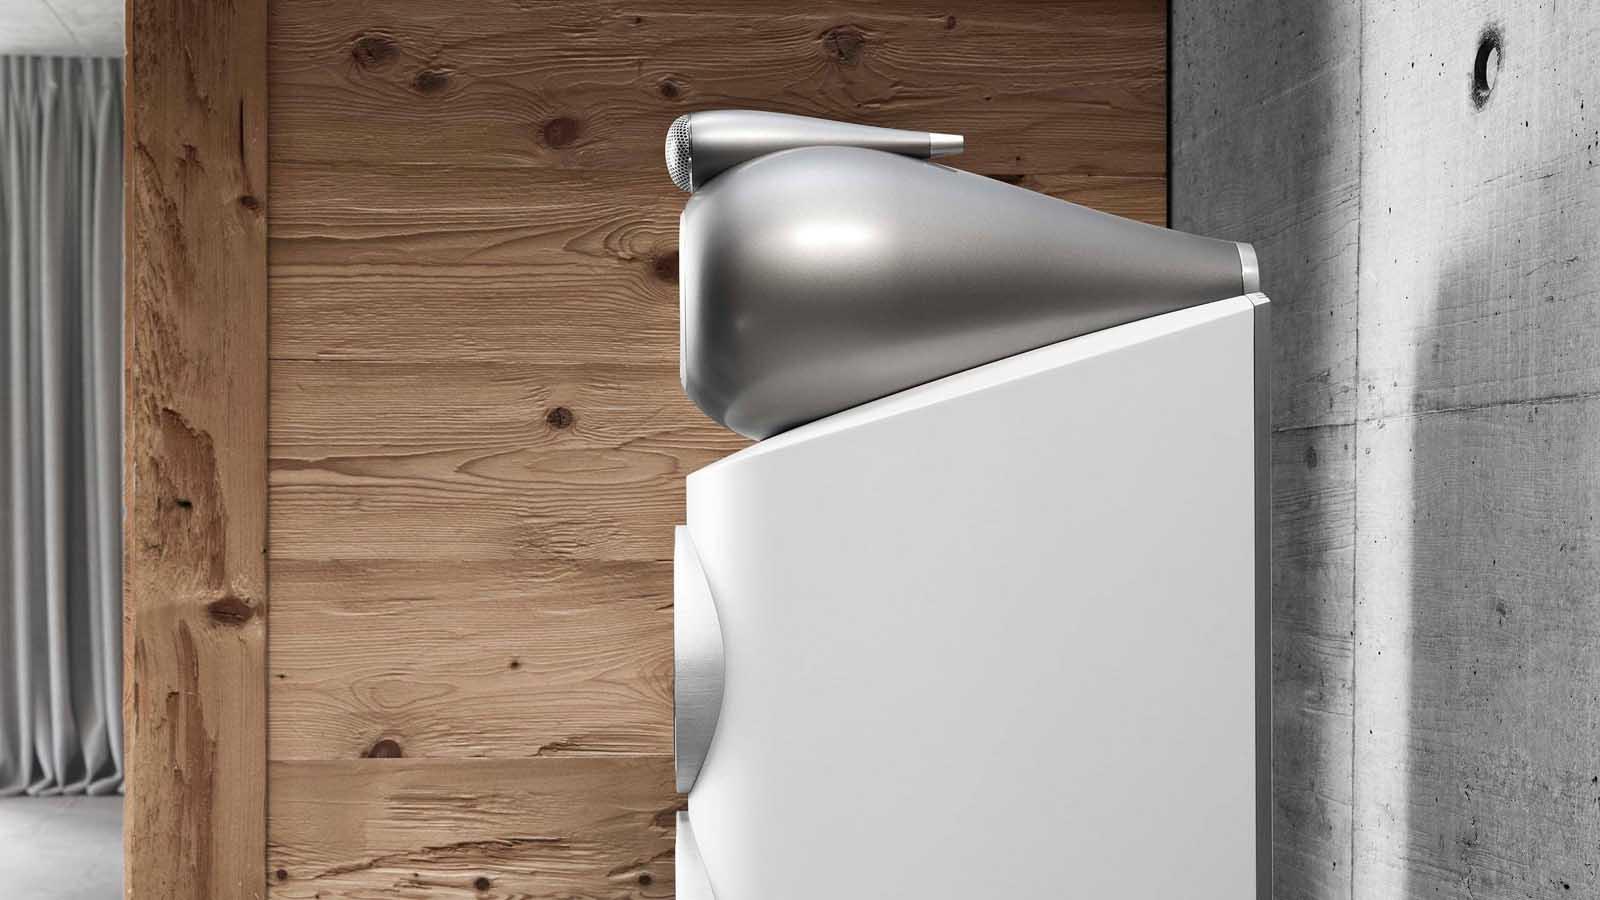 https://lamarque.fillion.ca/wp-content/uploads/2019/04/4-1-d-803-d3-803-series-diamond-speakers-white_0.jpg